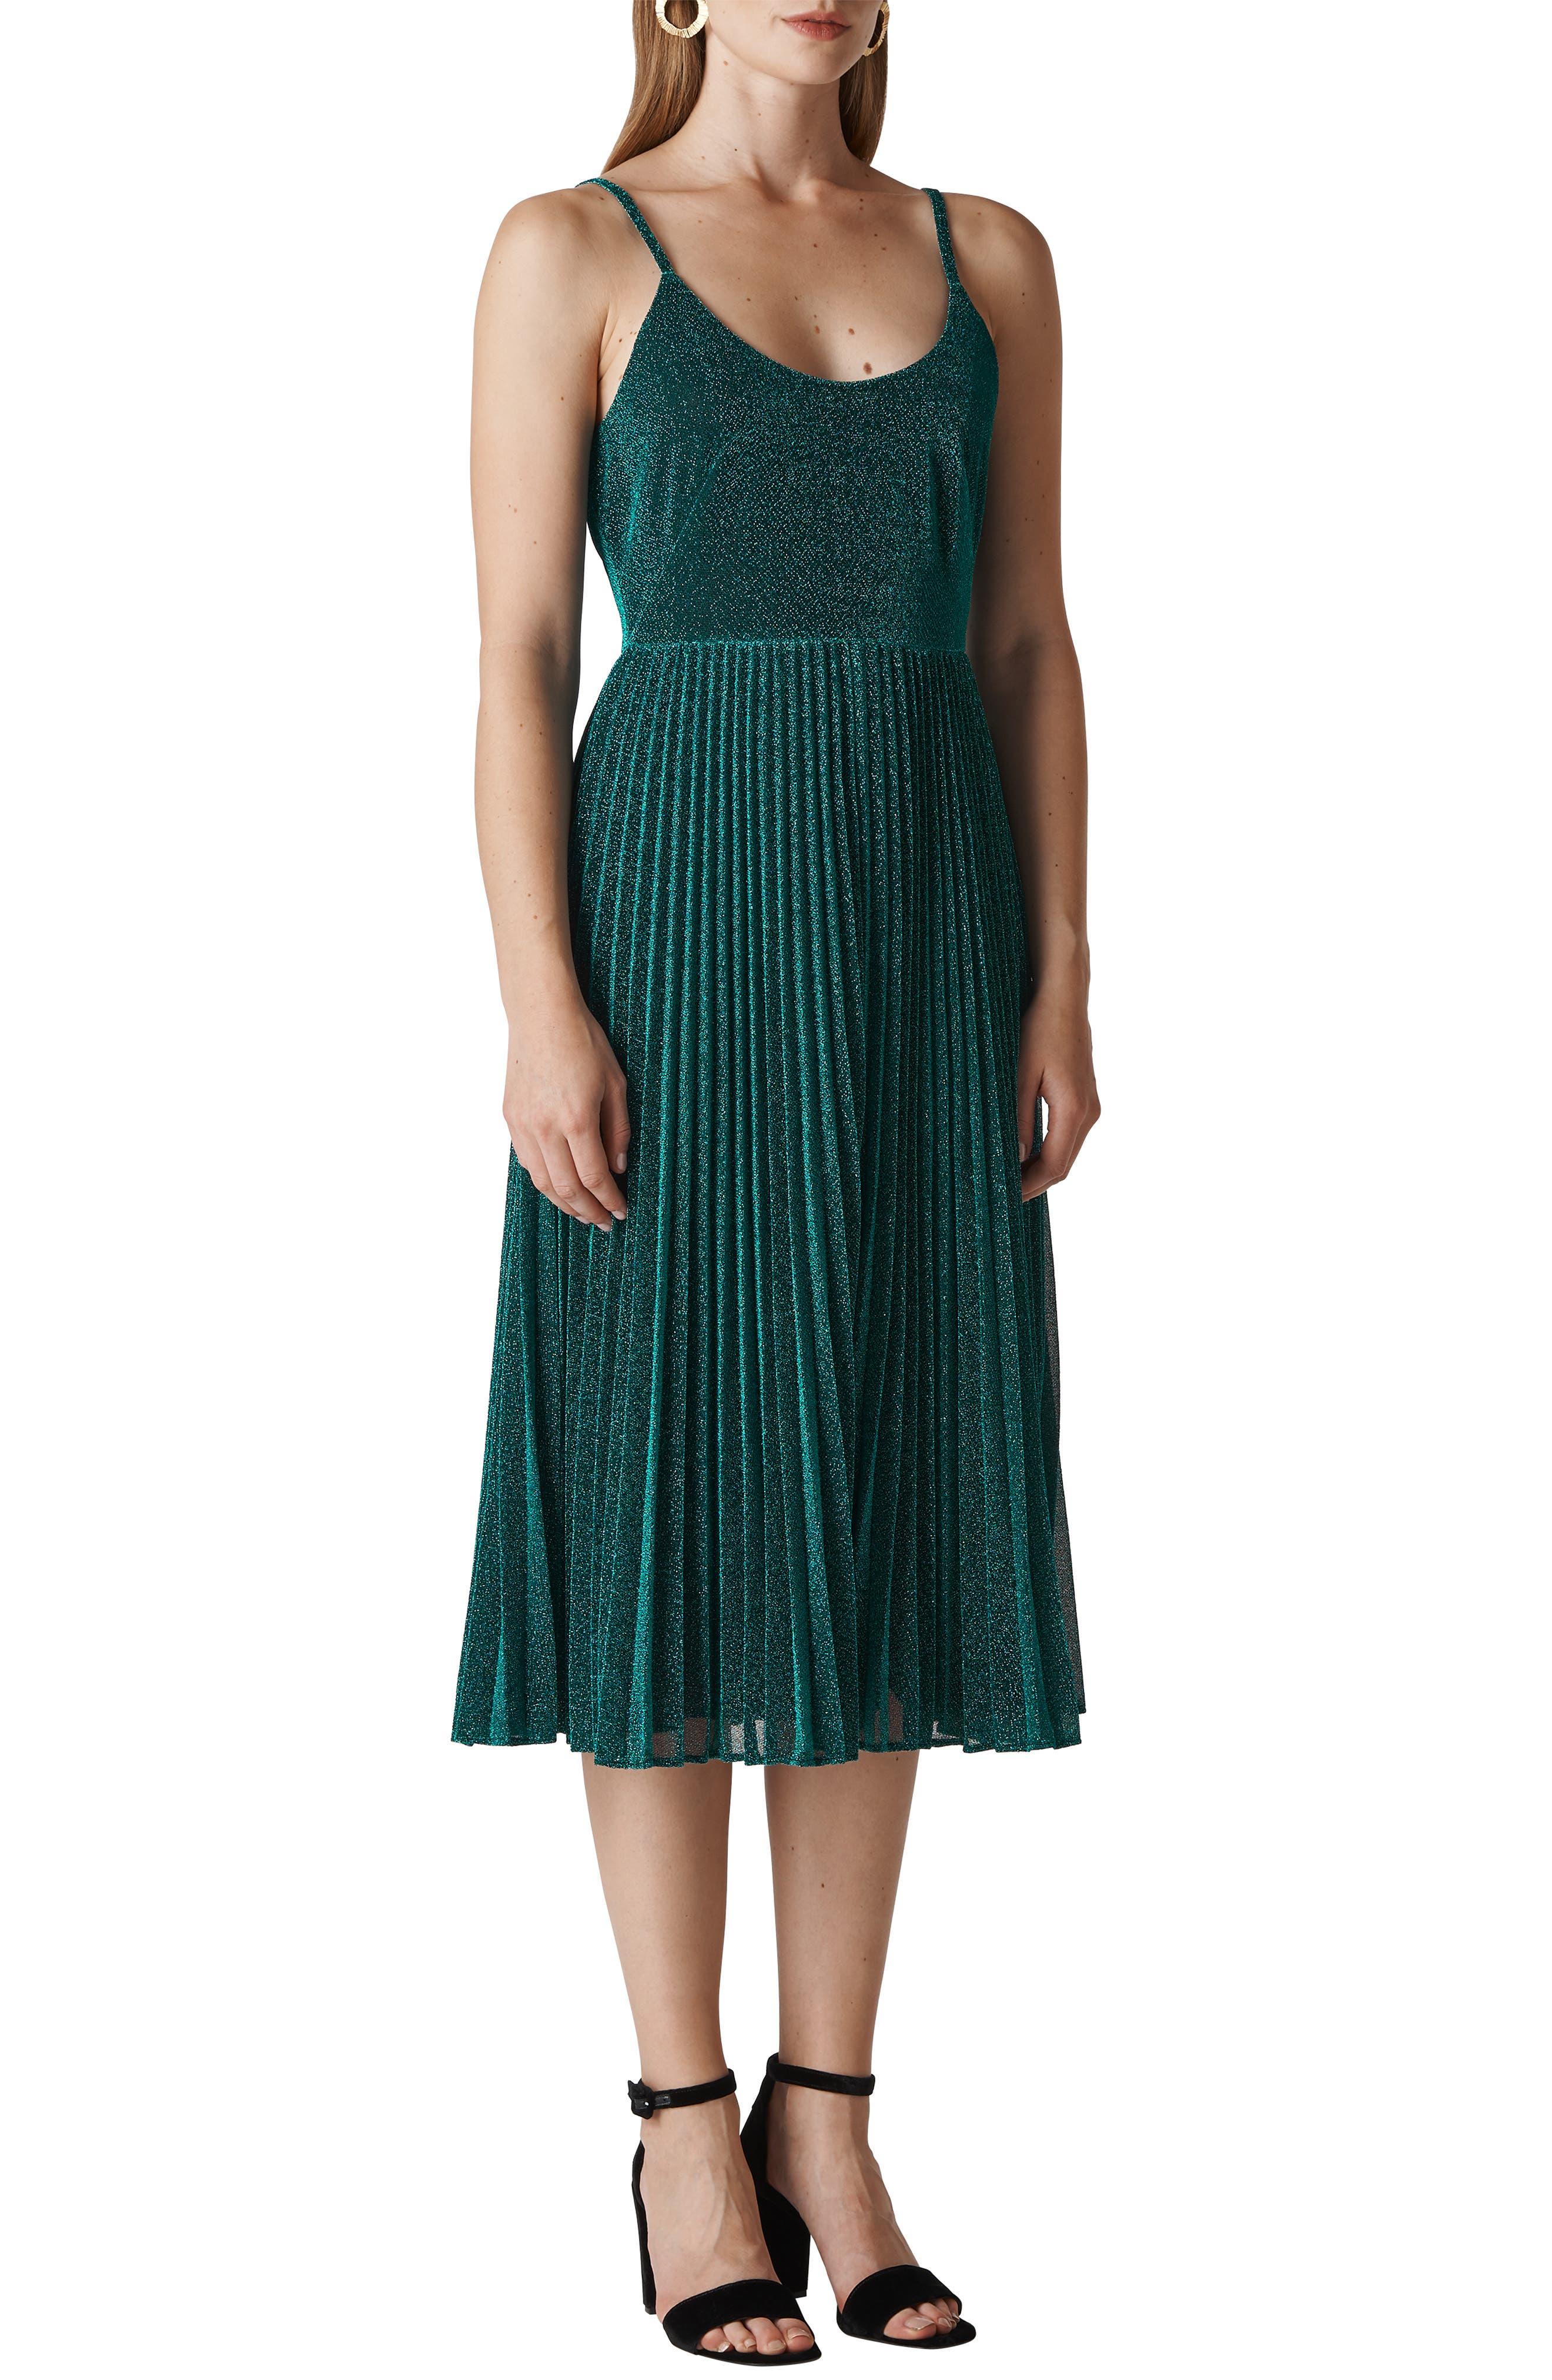 Regina Sparkle Pleated Midi Dress,                             Main thumbnail 1, color,                             GREEN